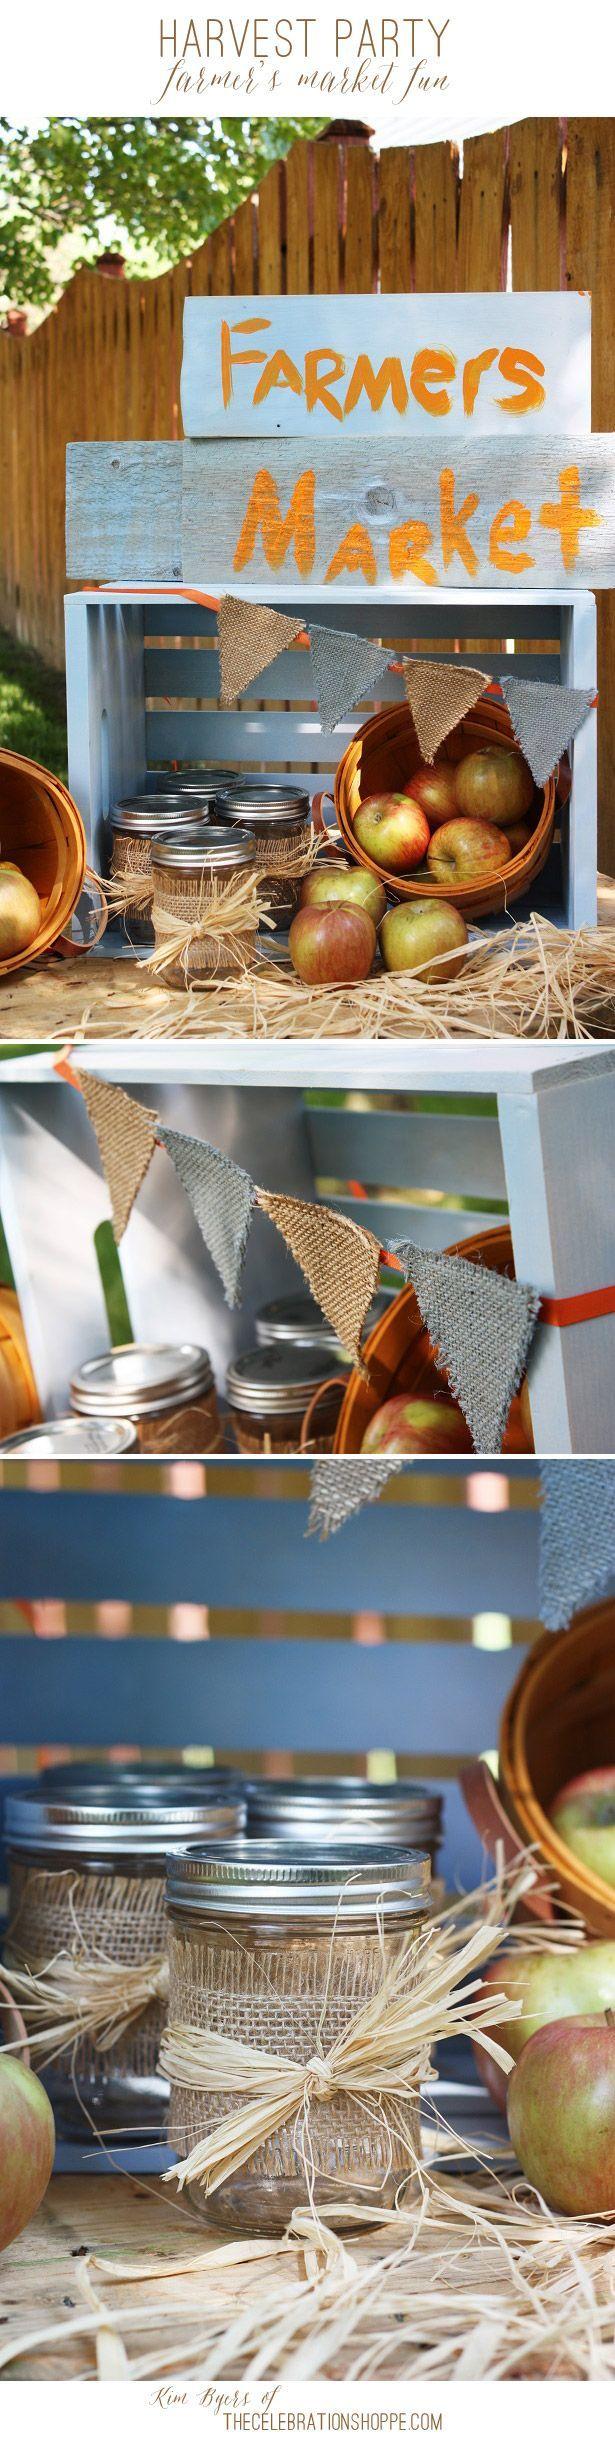 Fall Harvest Party Ideas - Mini Farmer's Market | Kim Byers - The Celebration Shoppe